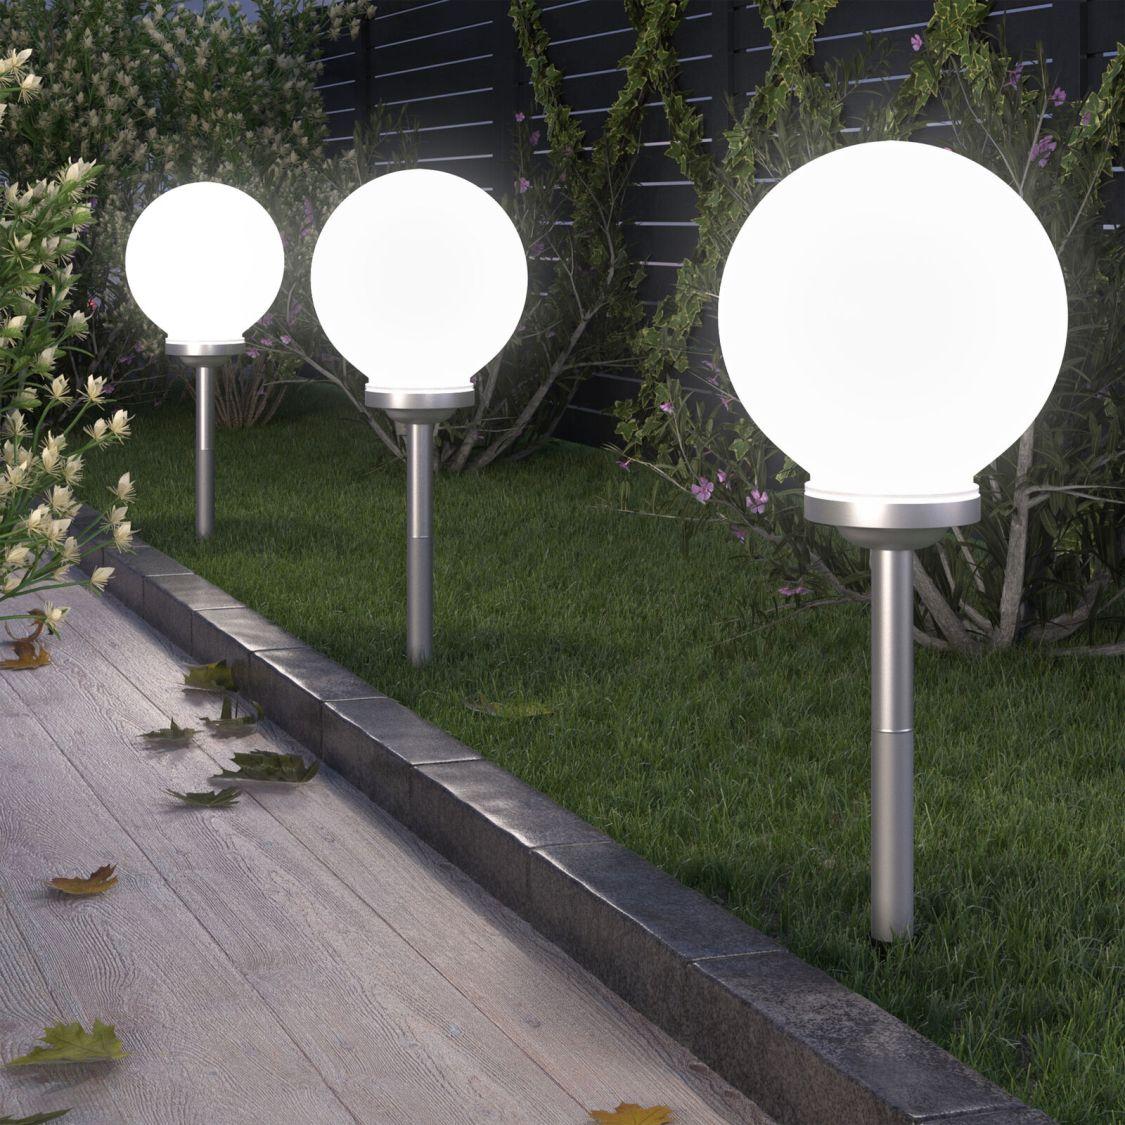 LED Solar Kugel Leuchtkugel Solarleuchte Solarlampe Solarkugel Leuchte Lampe